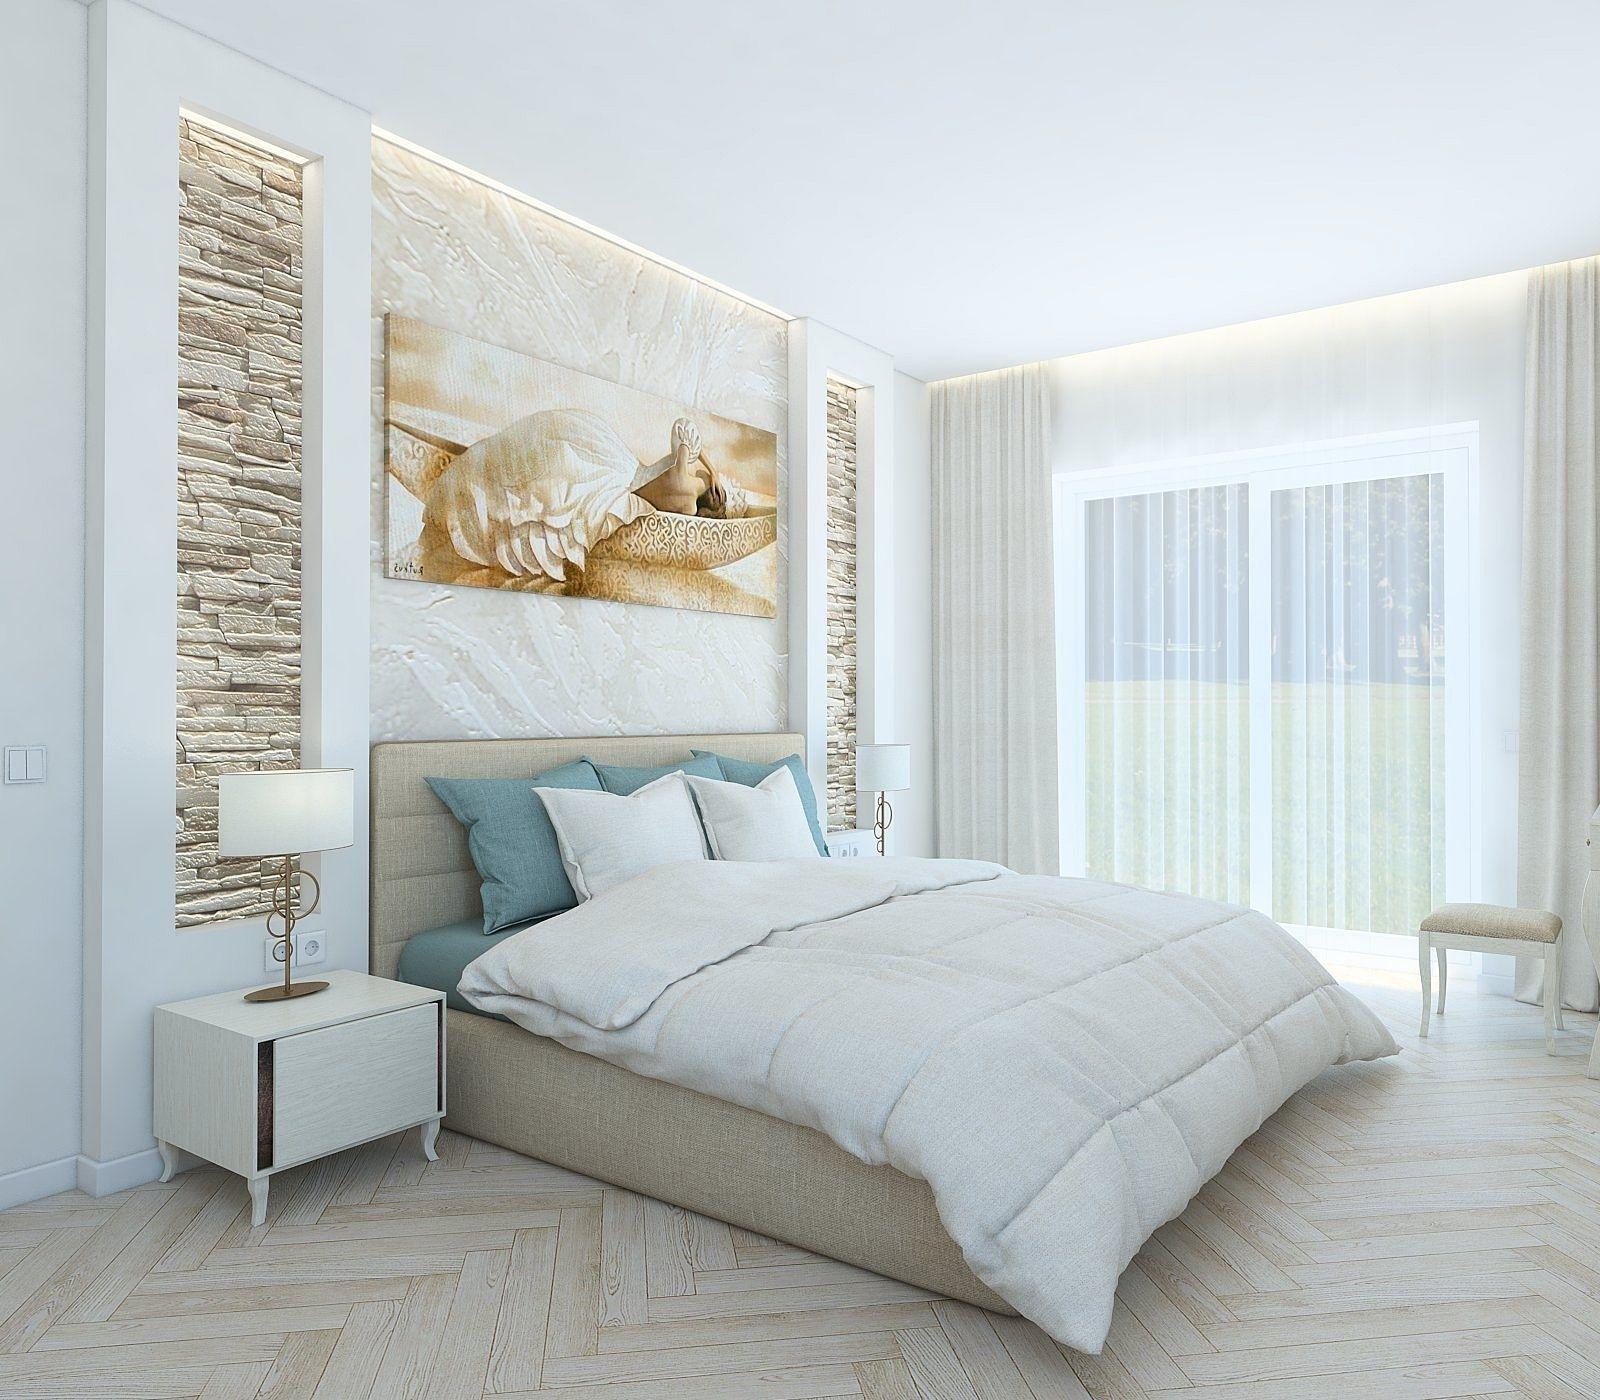 The cozy bedroom 3D   CGTrader on New Model Bedroom  id=74894